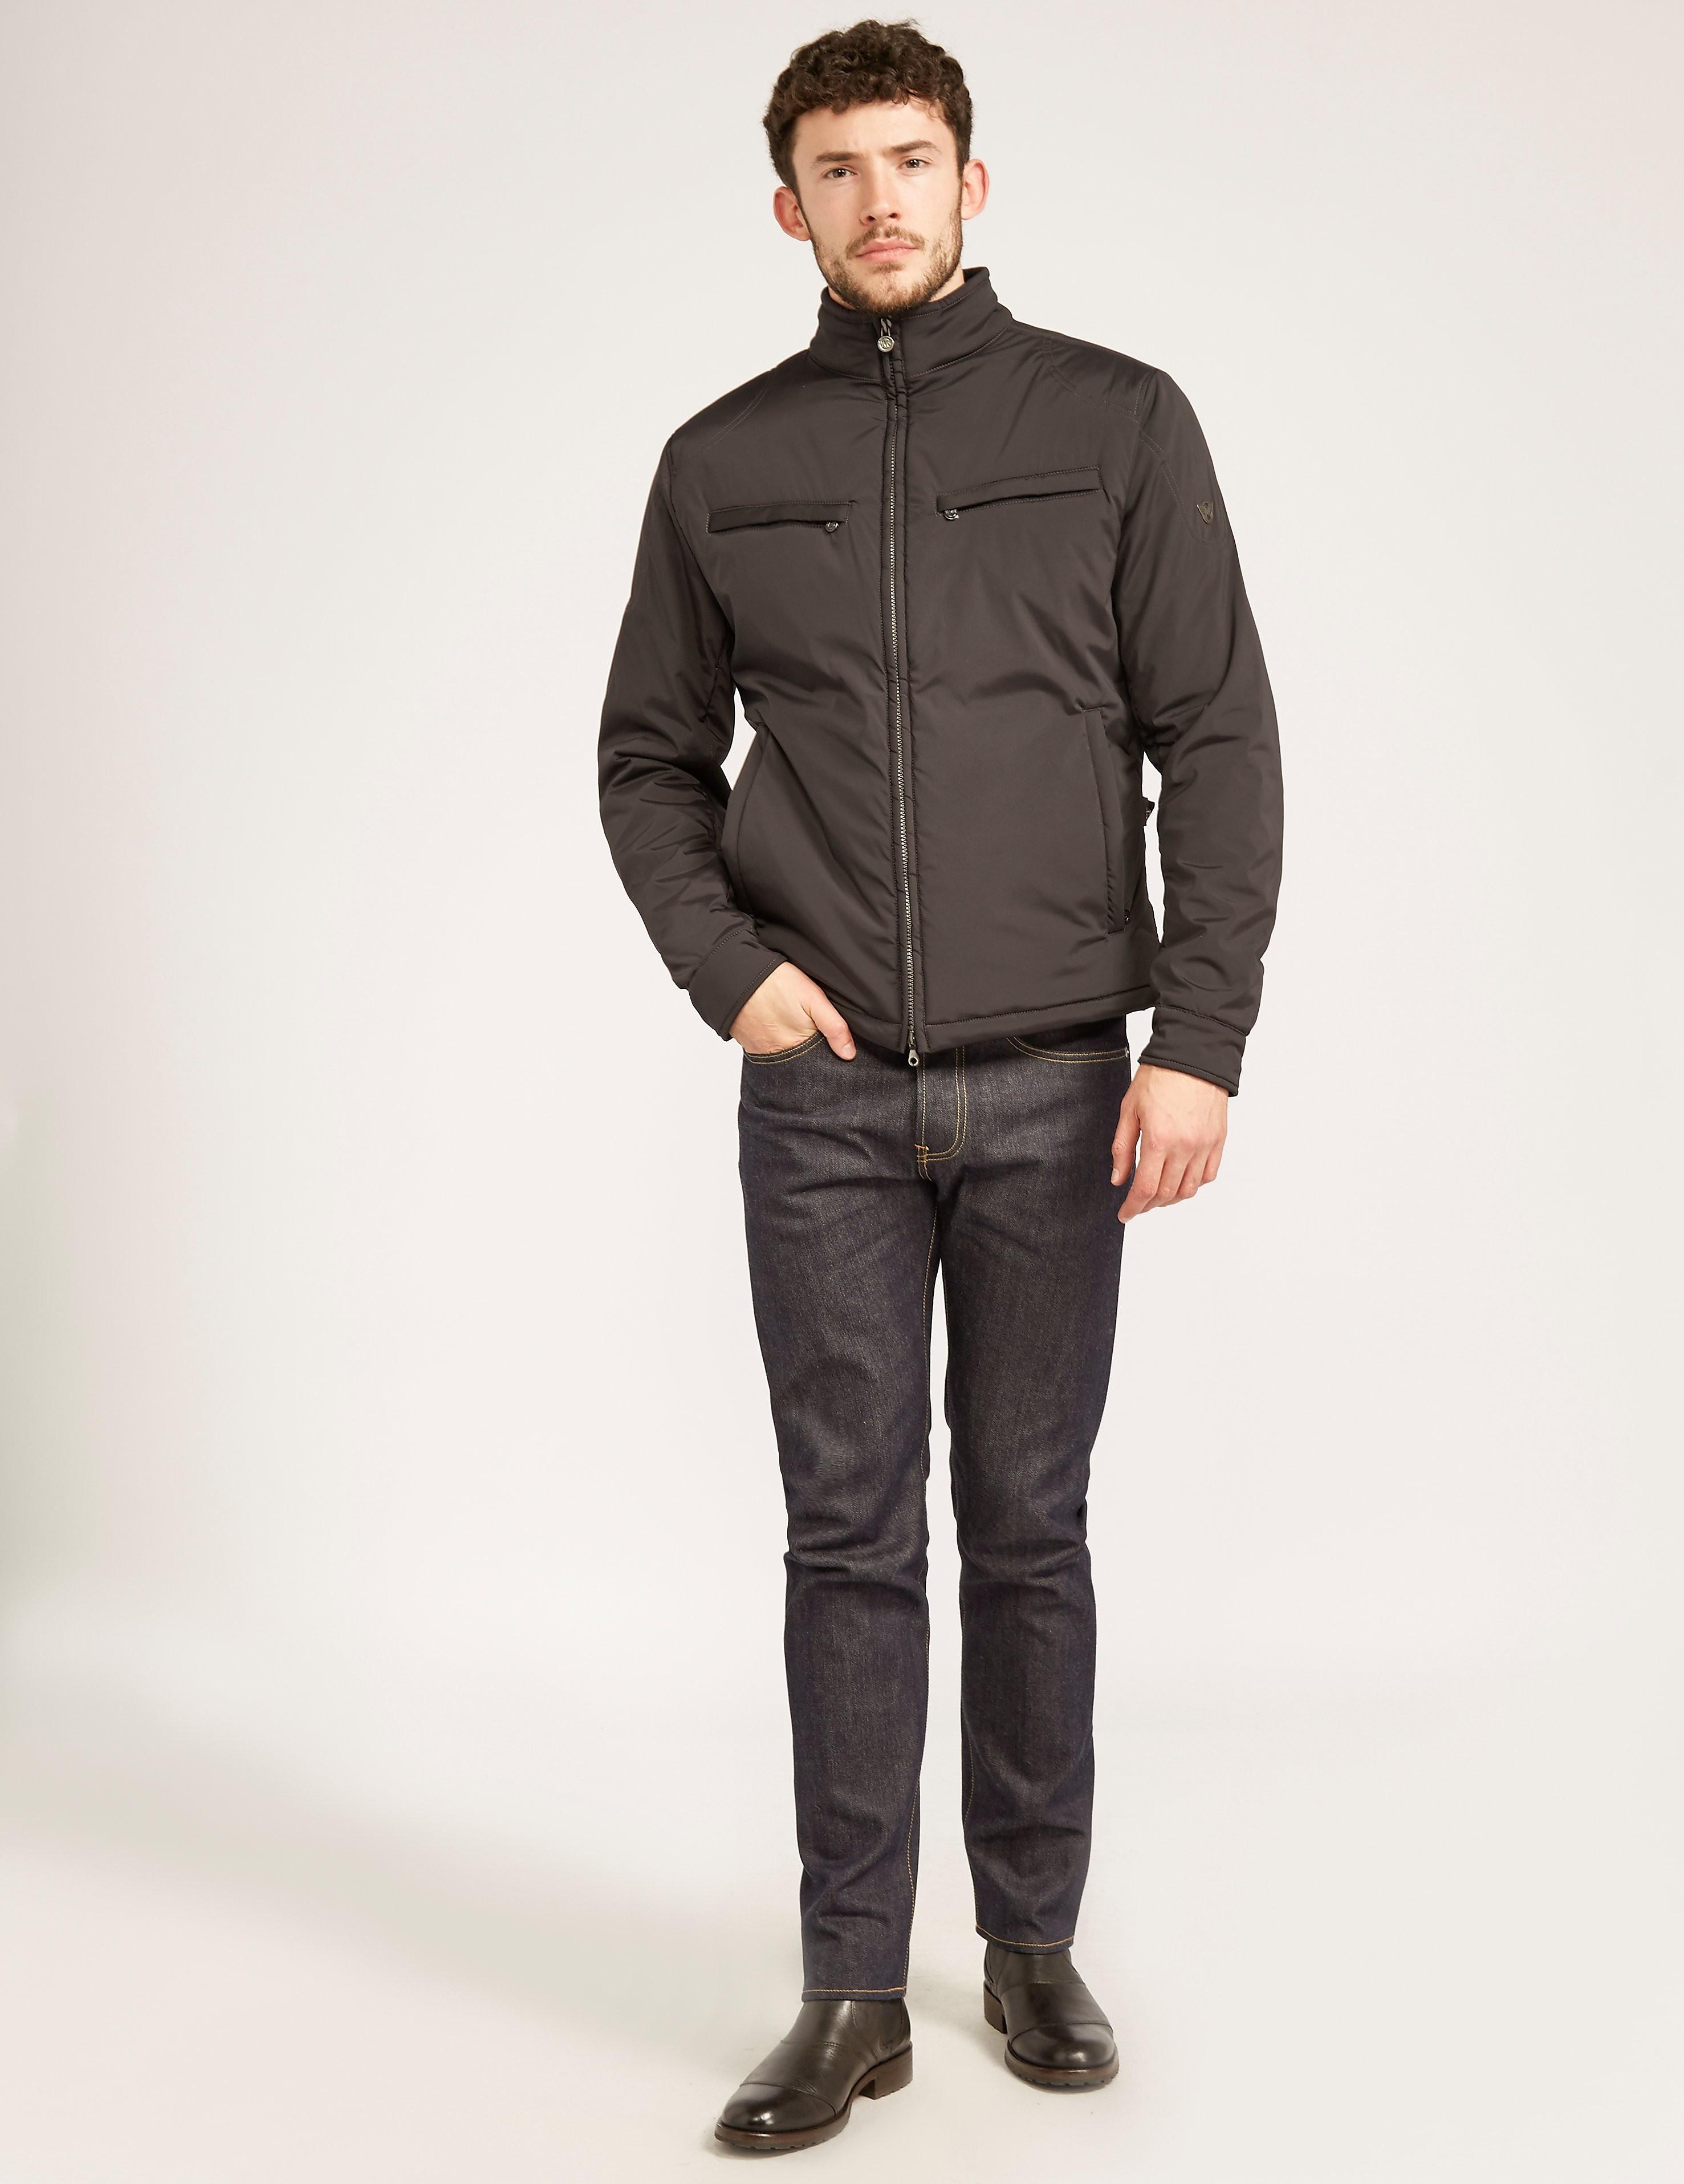 Matchless Ocelot Jacket